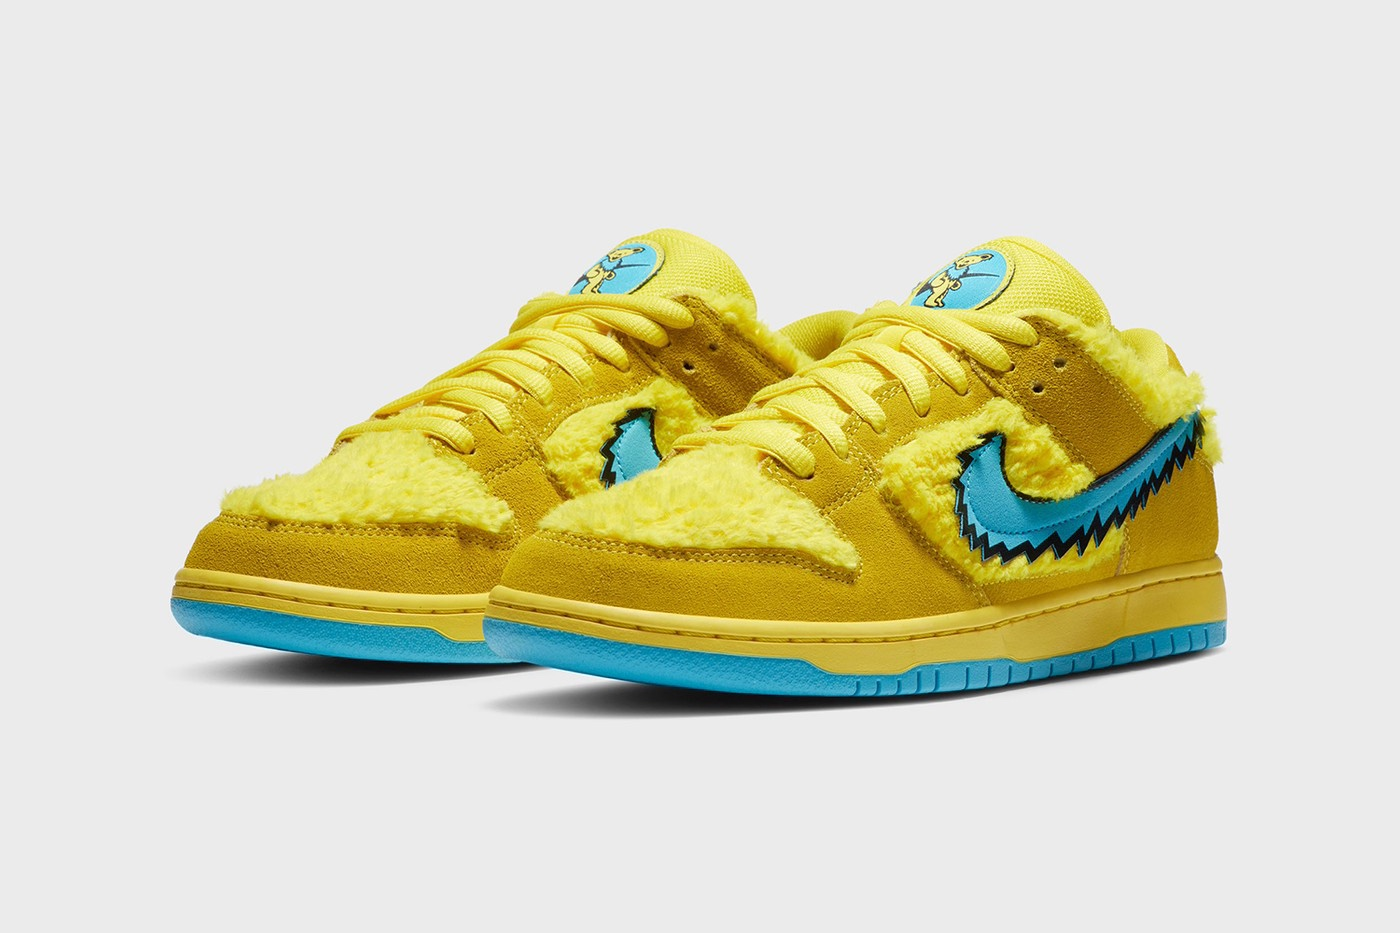 Versione Gialla Nike SB Dunk Low Grateful Dead